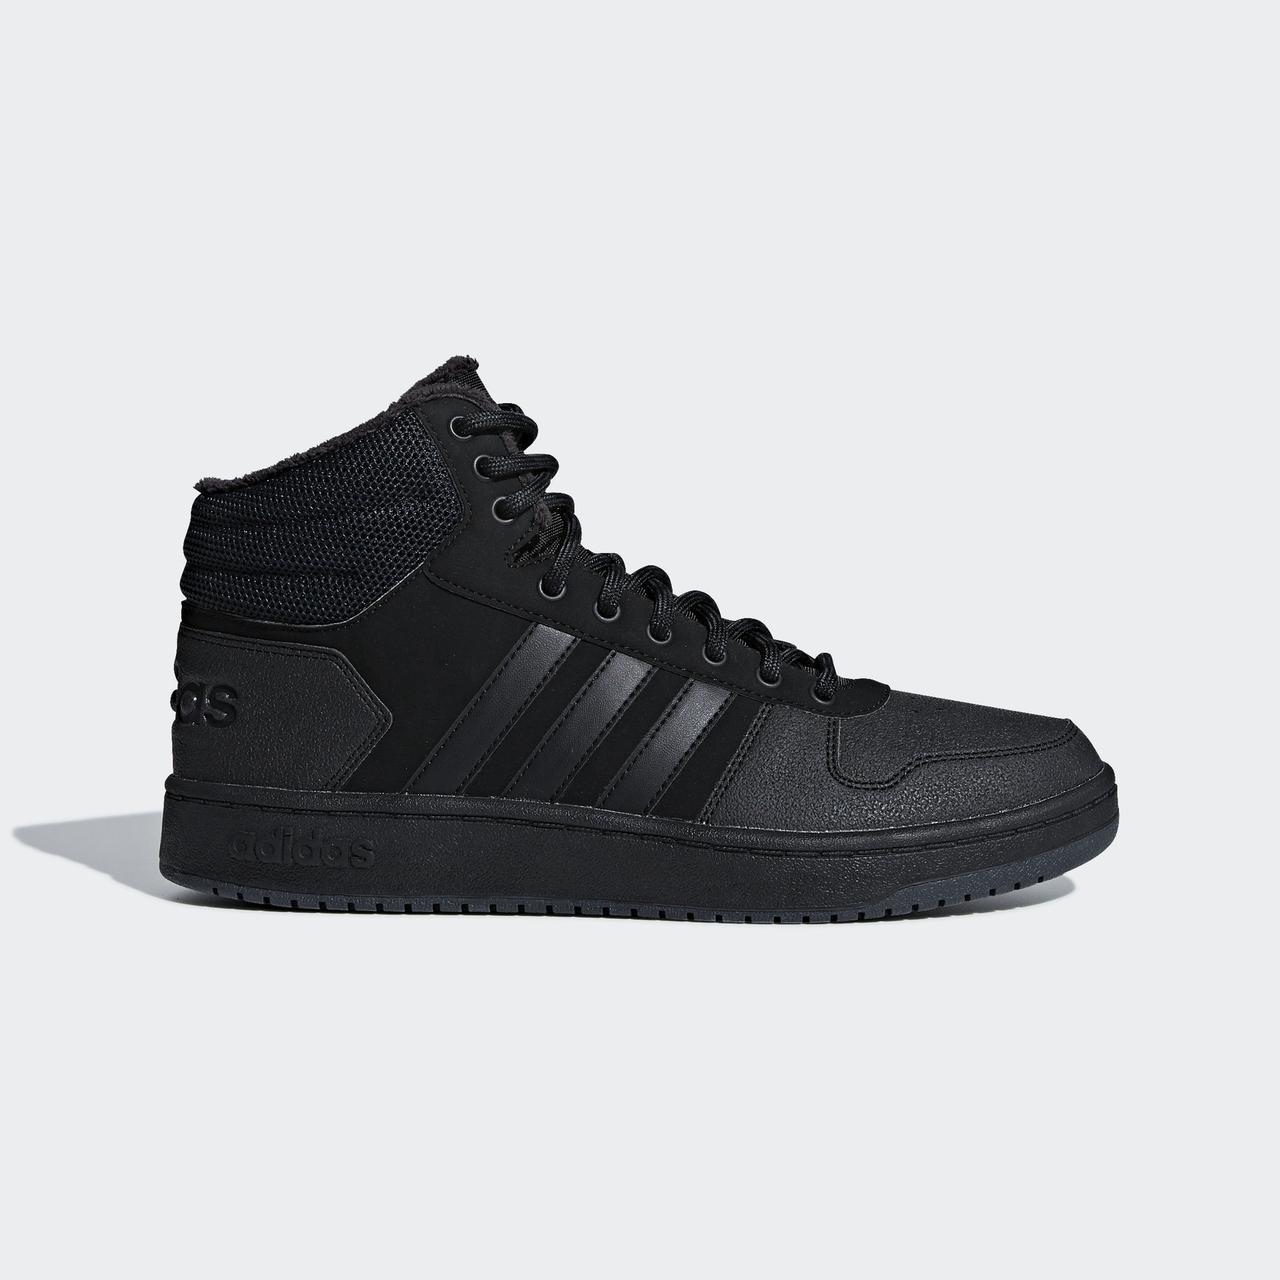 a234d10a Зимние кроссовки Adidas Hoops 2.0 Mid B44621 - 2018/2 - Интернет магазин  Tip -